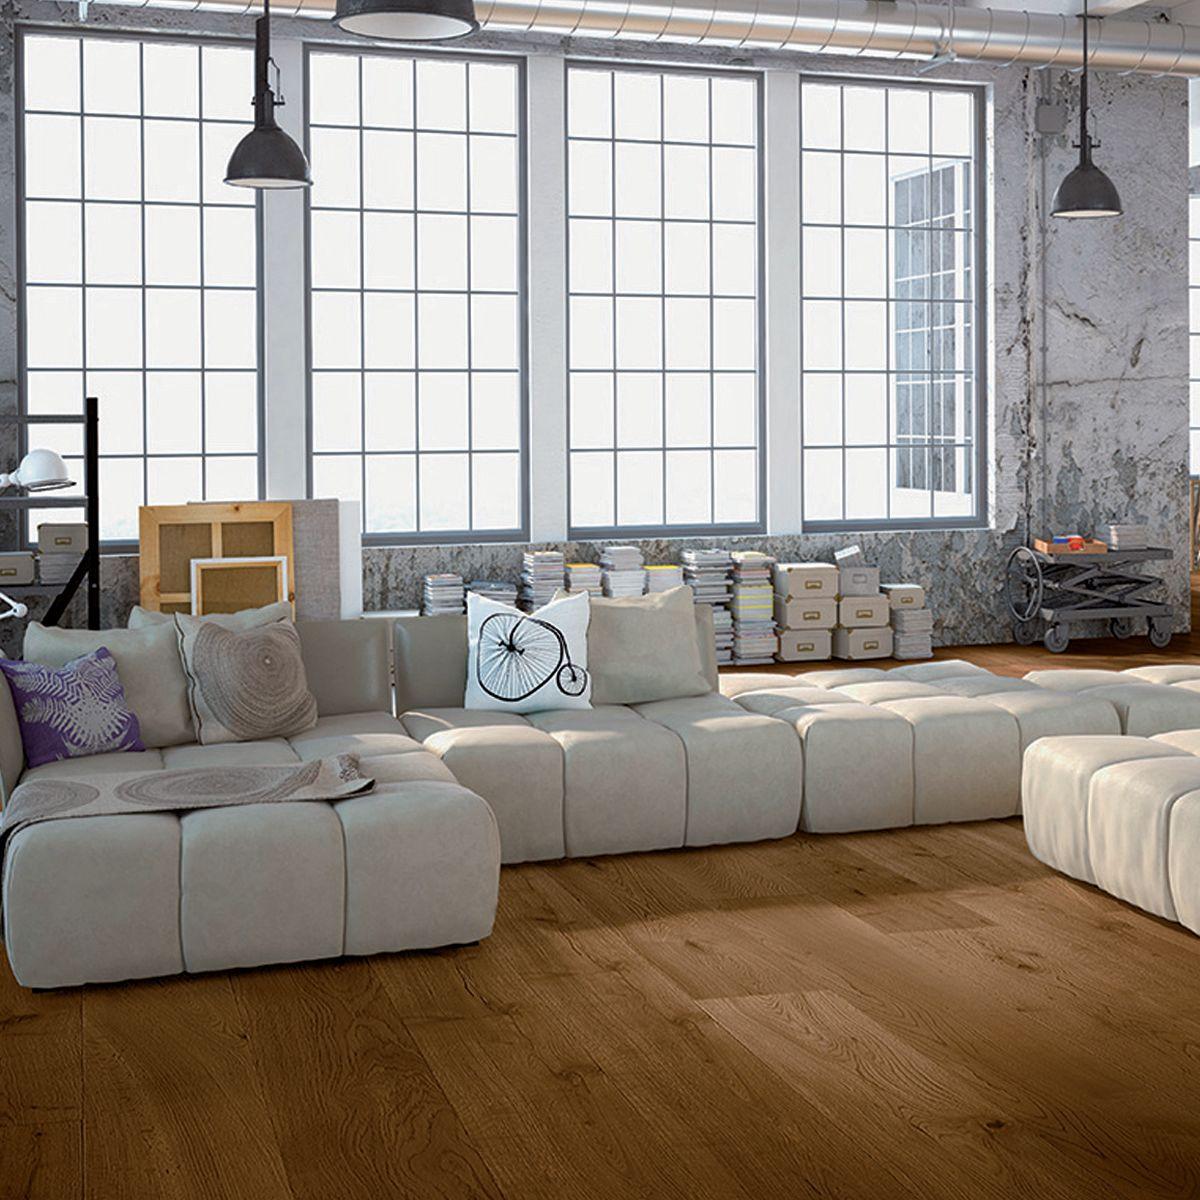 parquet flottante prezzi leroy merlin stores venitiens en bois with parquet flottante prezzi. Black Bedroom Furniture Sets. Home Design Ideas